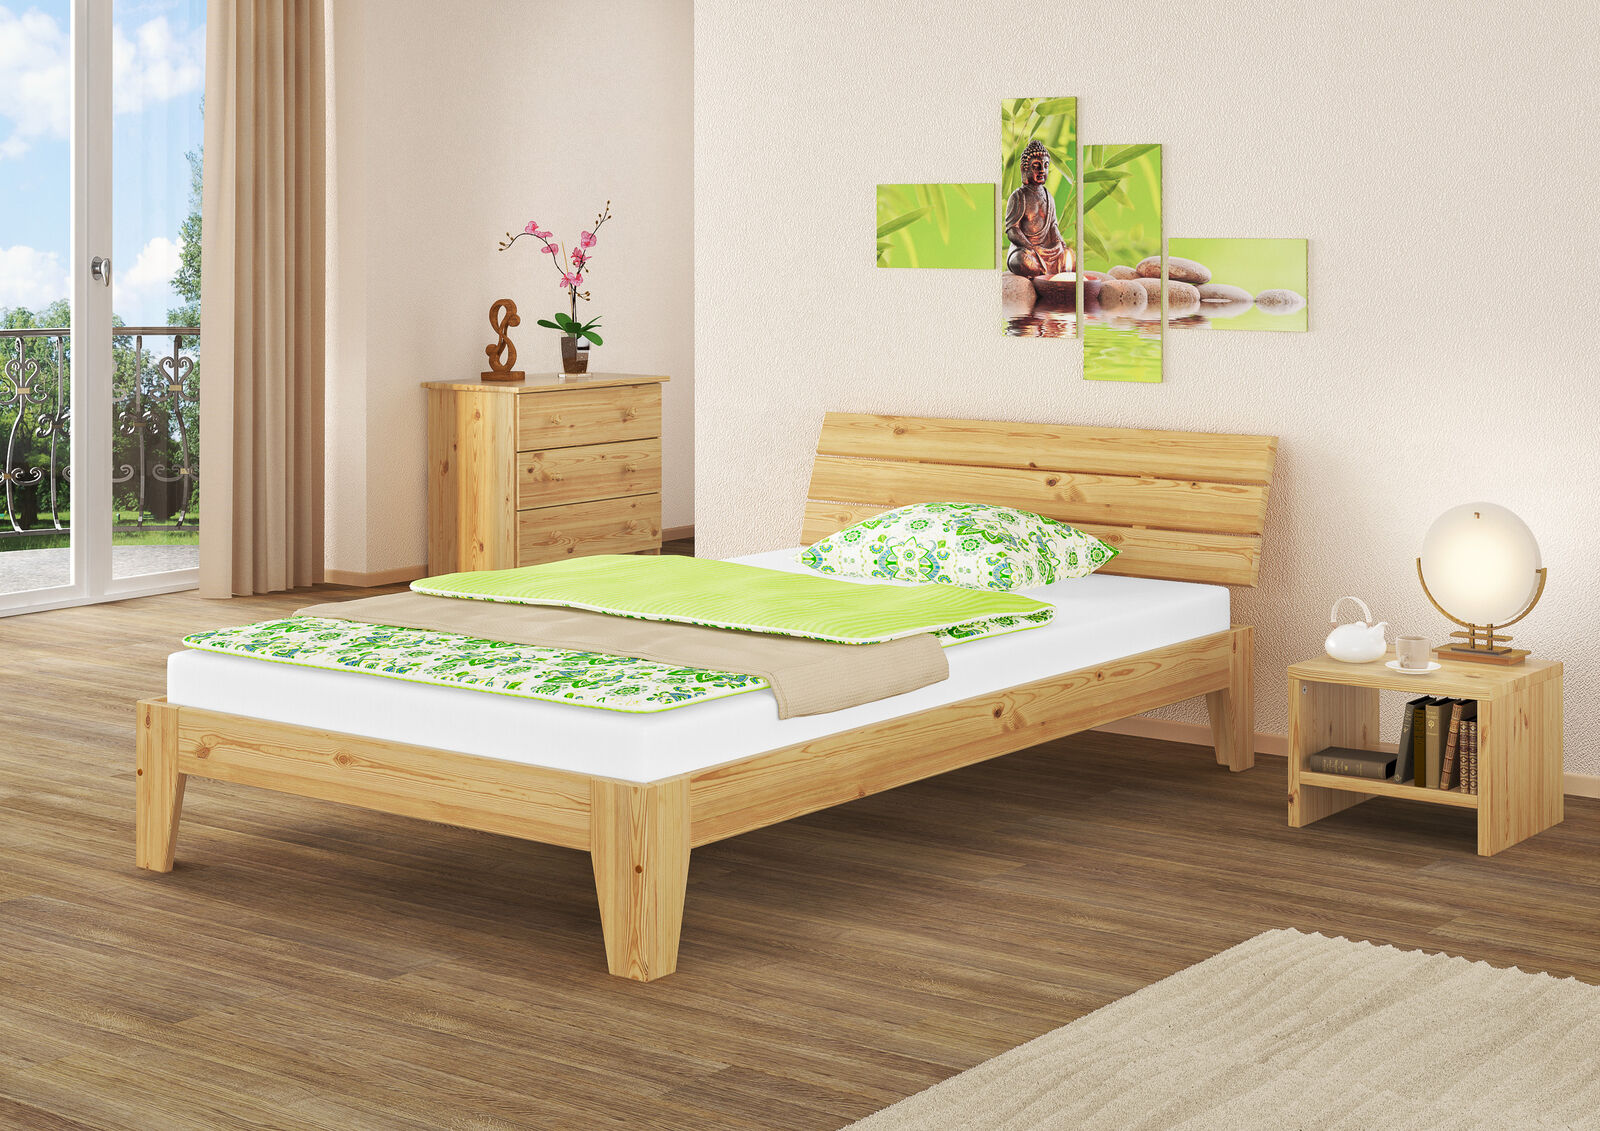 Bois massif Lit 140x200 avec rollrost lits bois naturel lits en bois 60.62-14